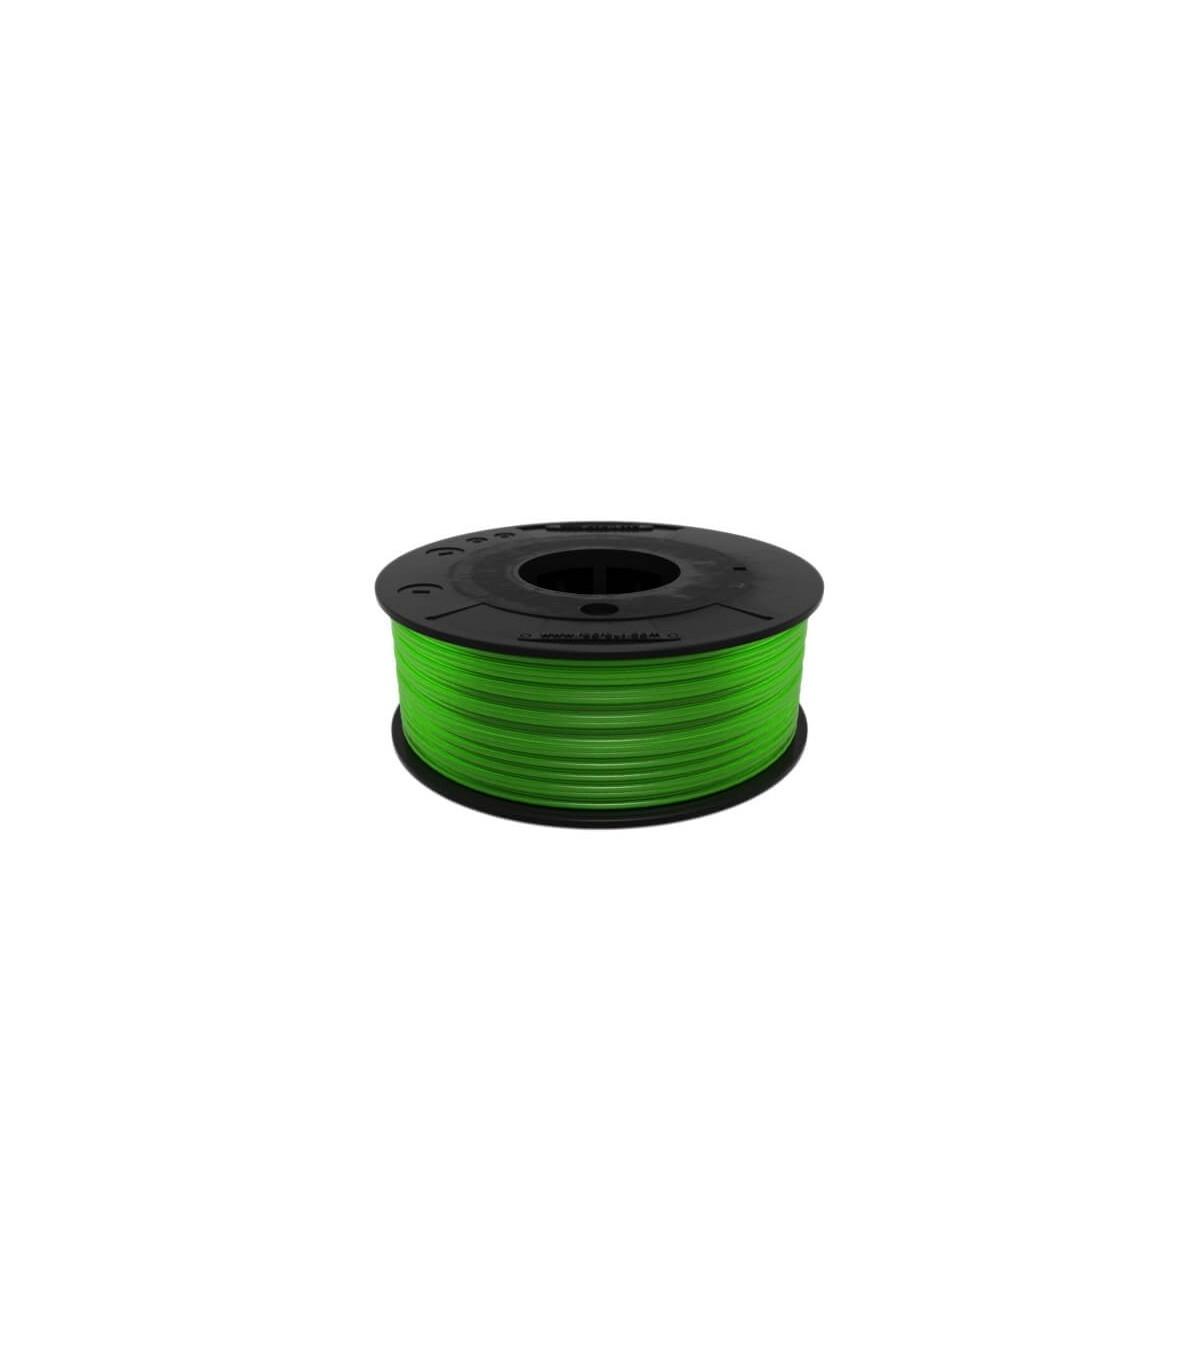 FilaFlex Clear Green 82A TPE Filament 1.75 mm 250g